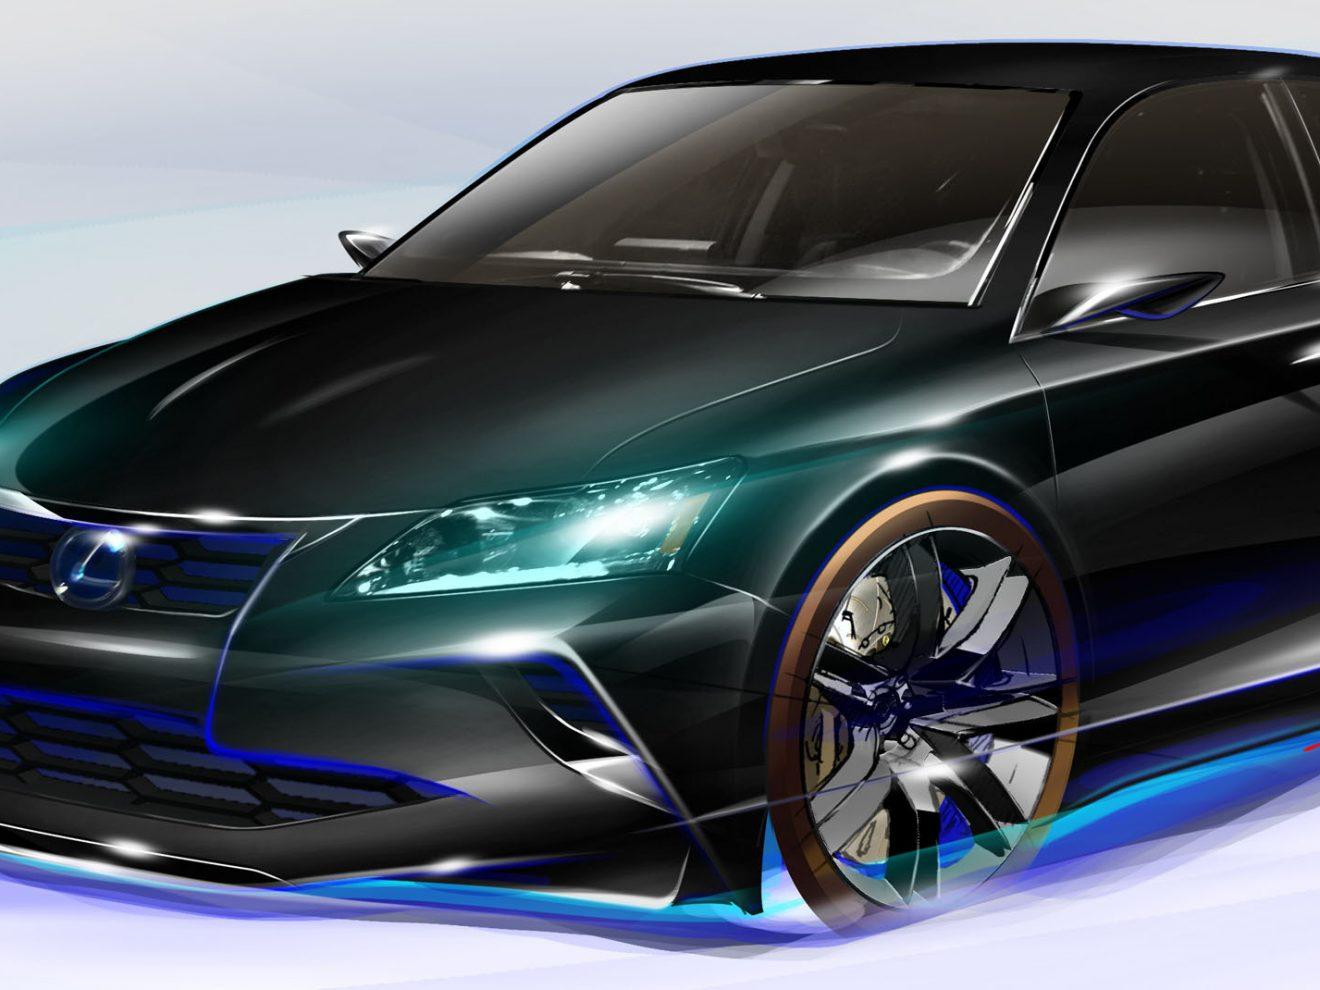 Lexus, wild side, chicago auto show, F sport, V10 LFA supercar